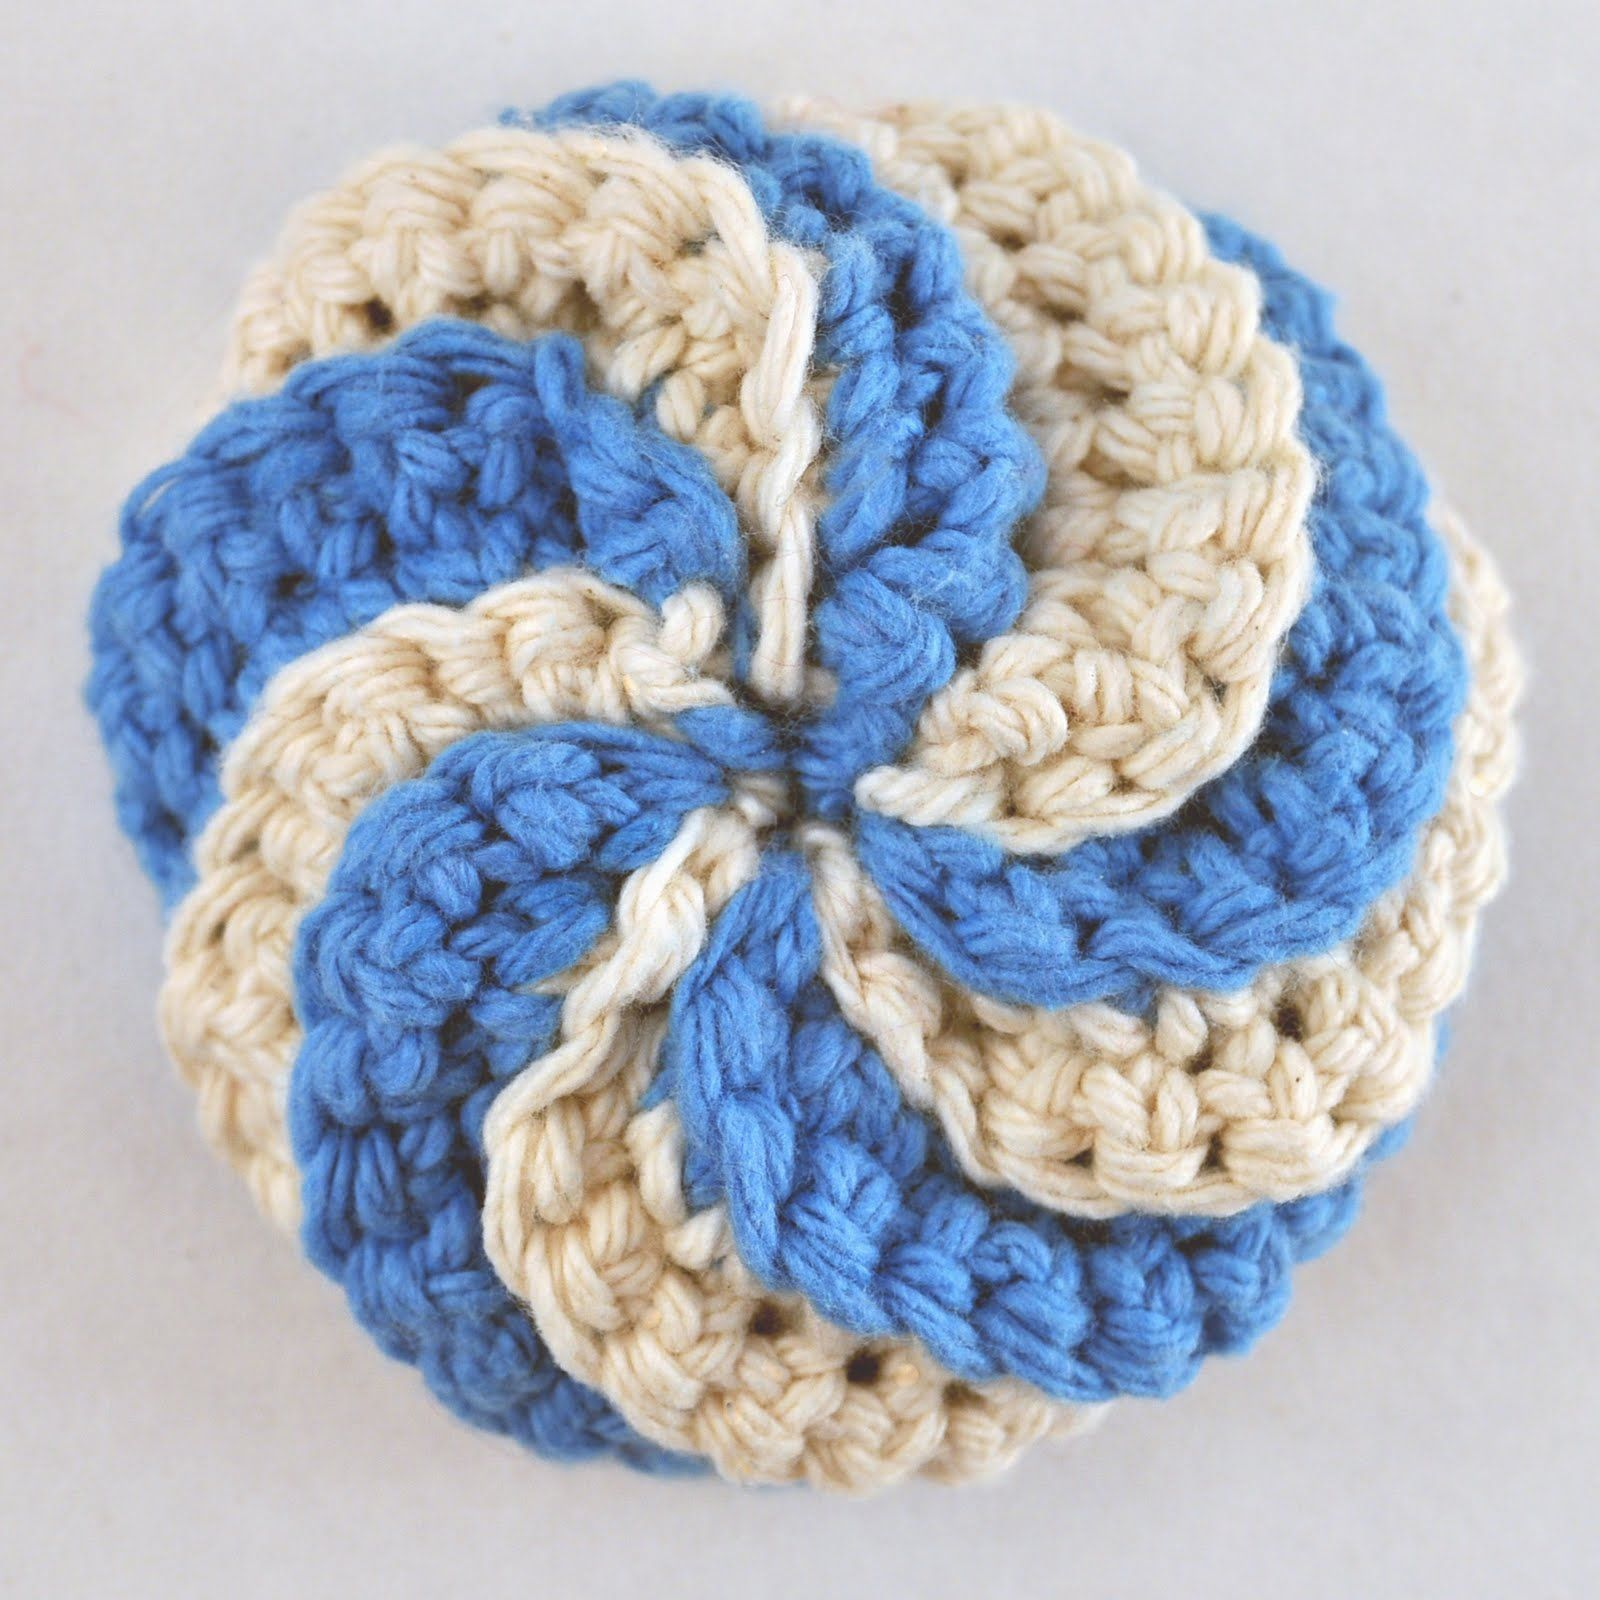 CrochetBeautyShoppe: Crochet Tawashi Scrubbies | Crochet/Knitting ...